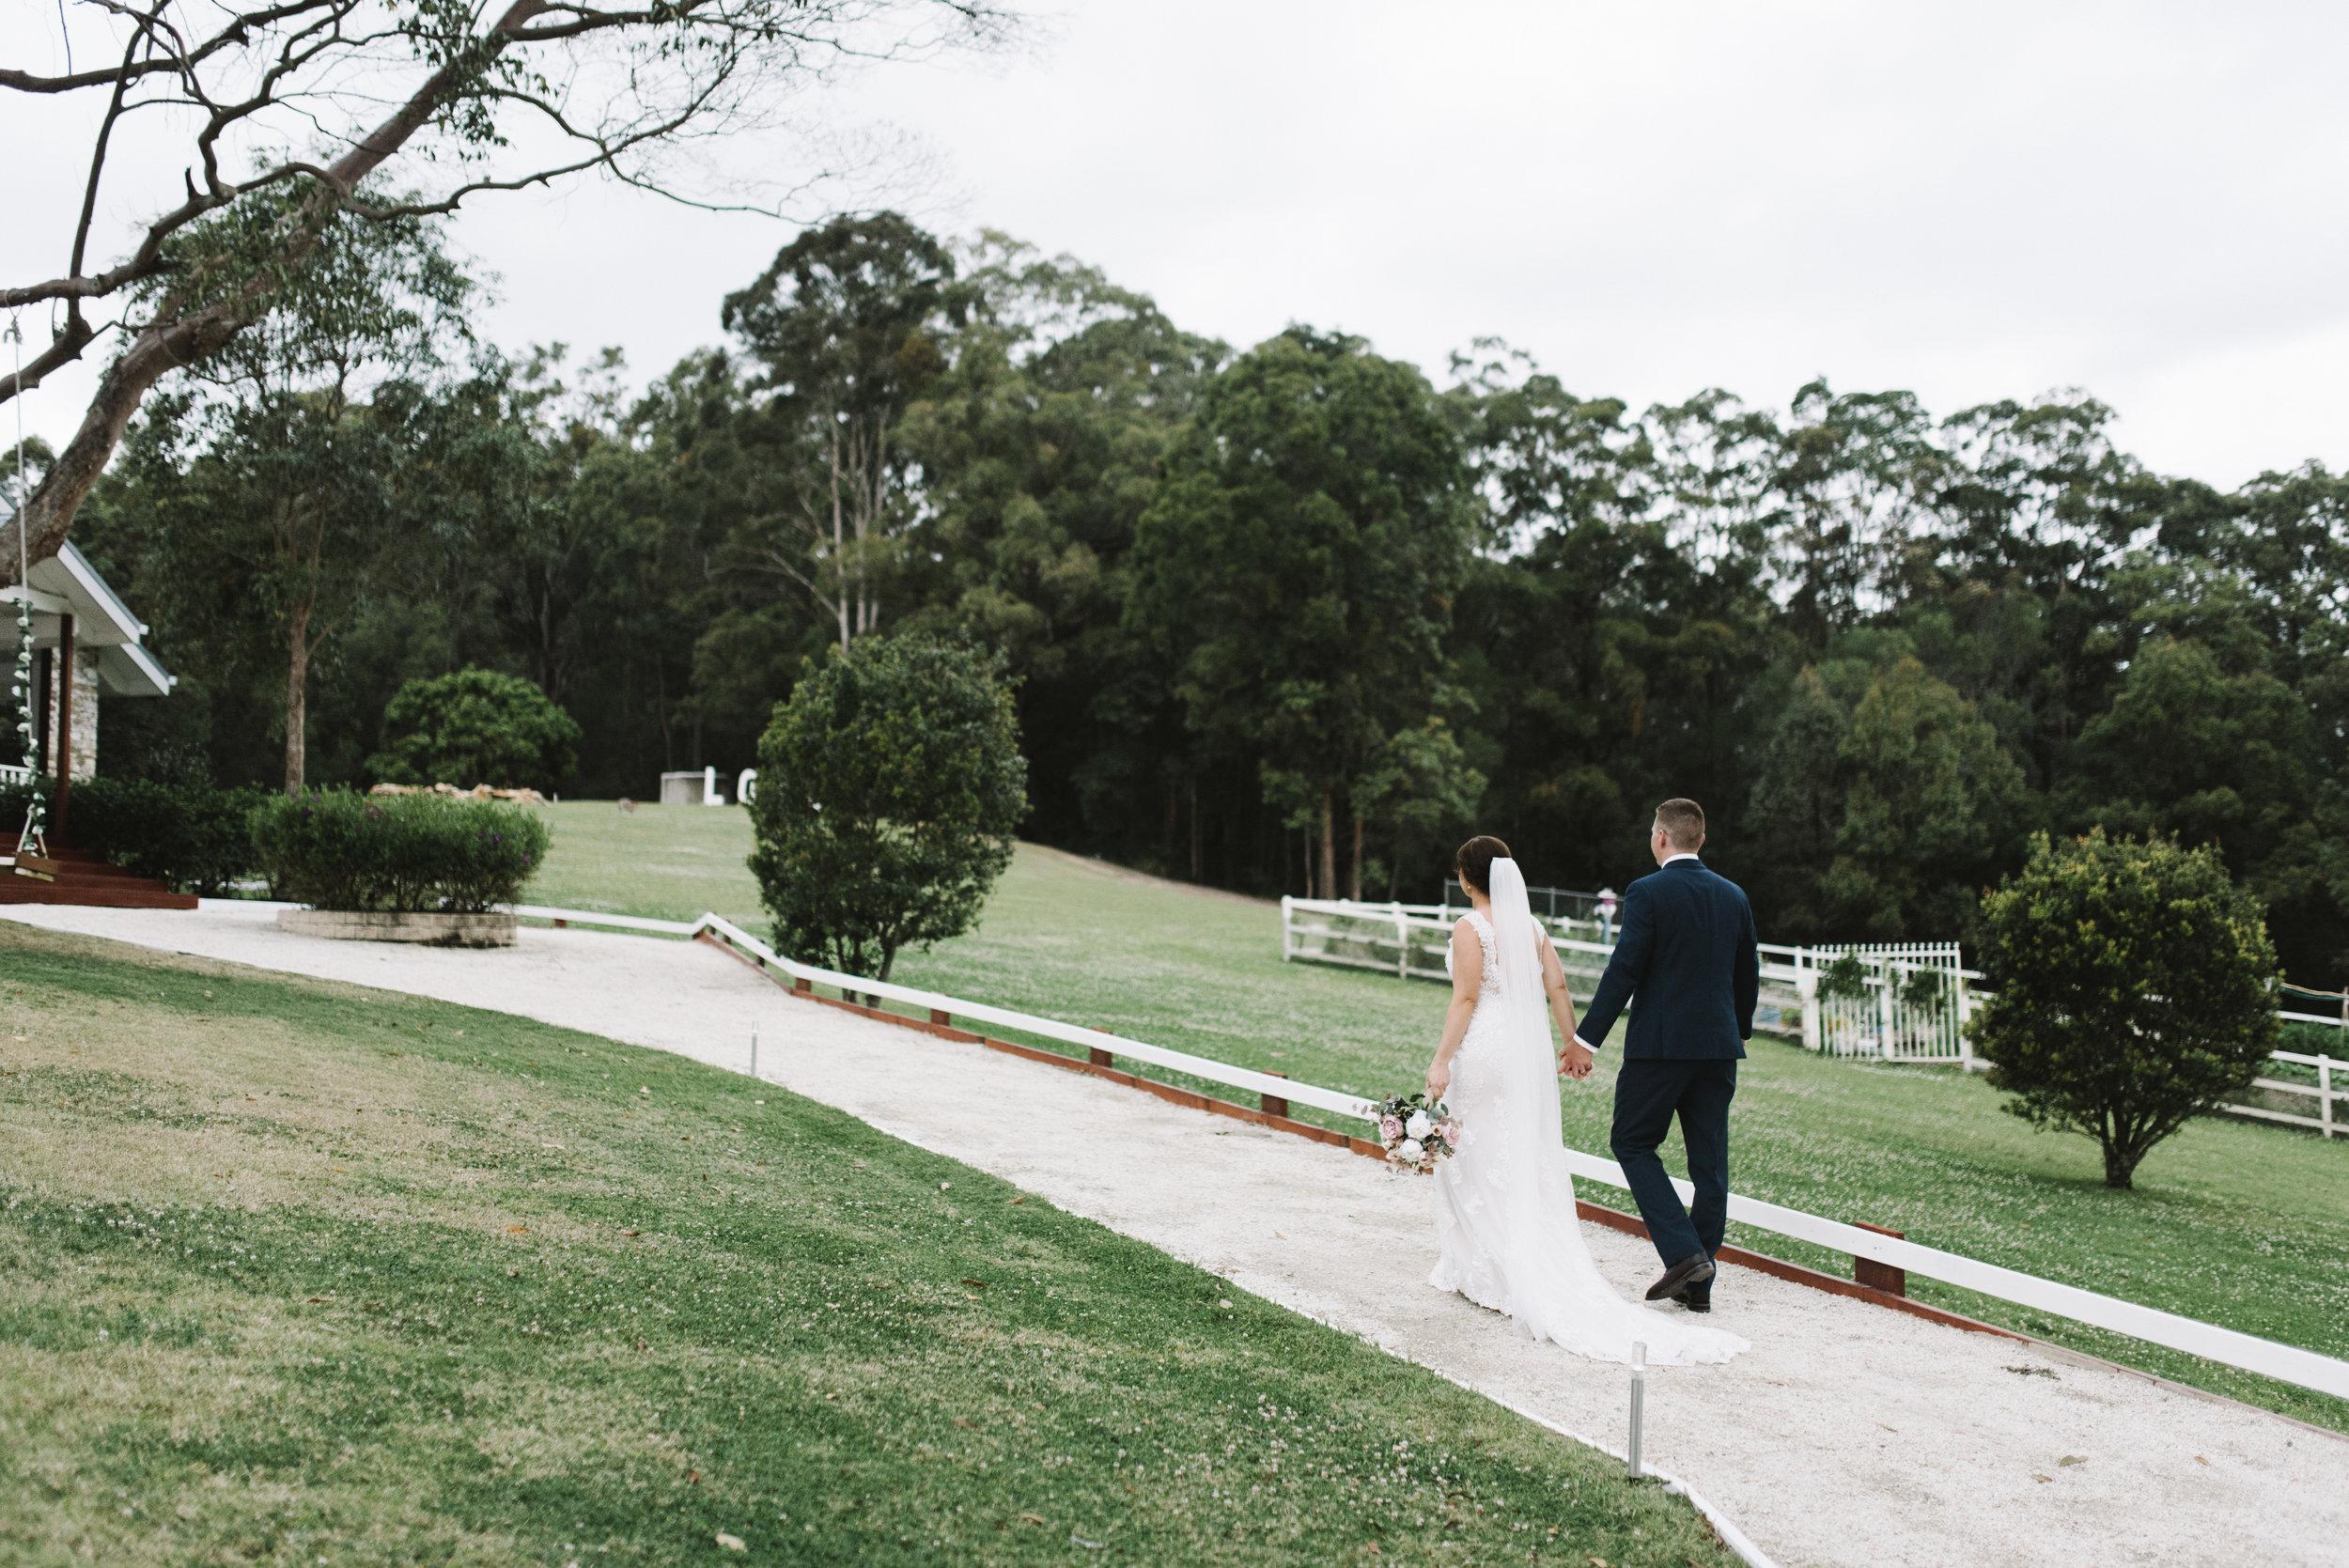 LAURENOLIVIA-austinvilla-estate-wedding-67.jpg